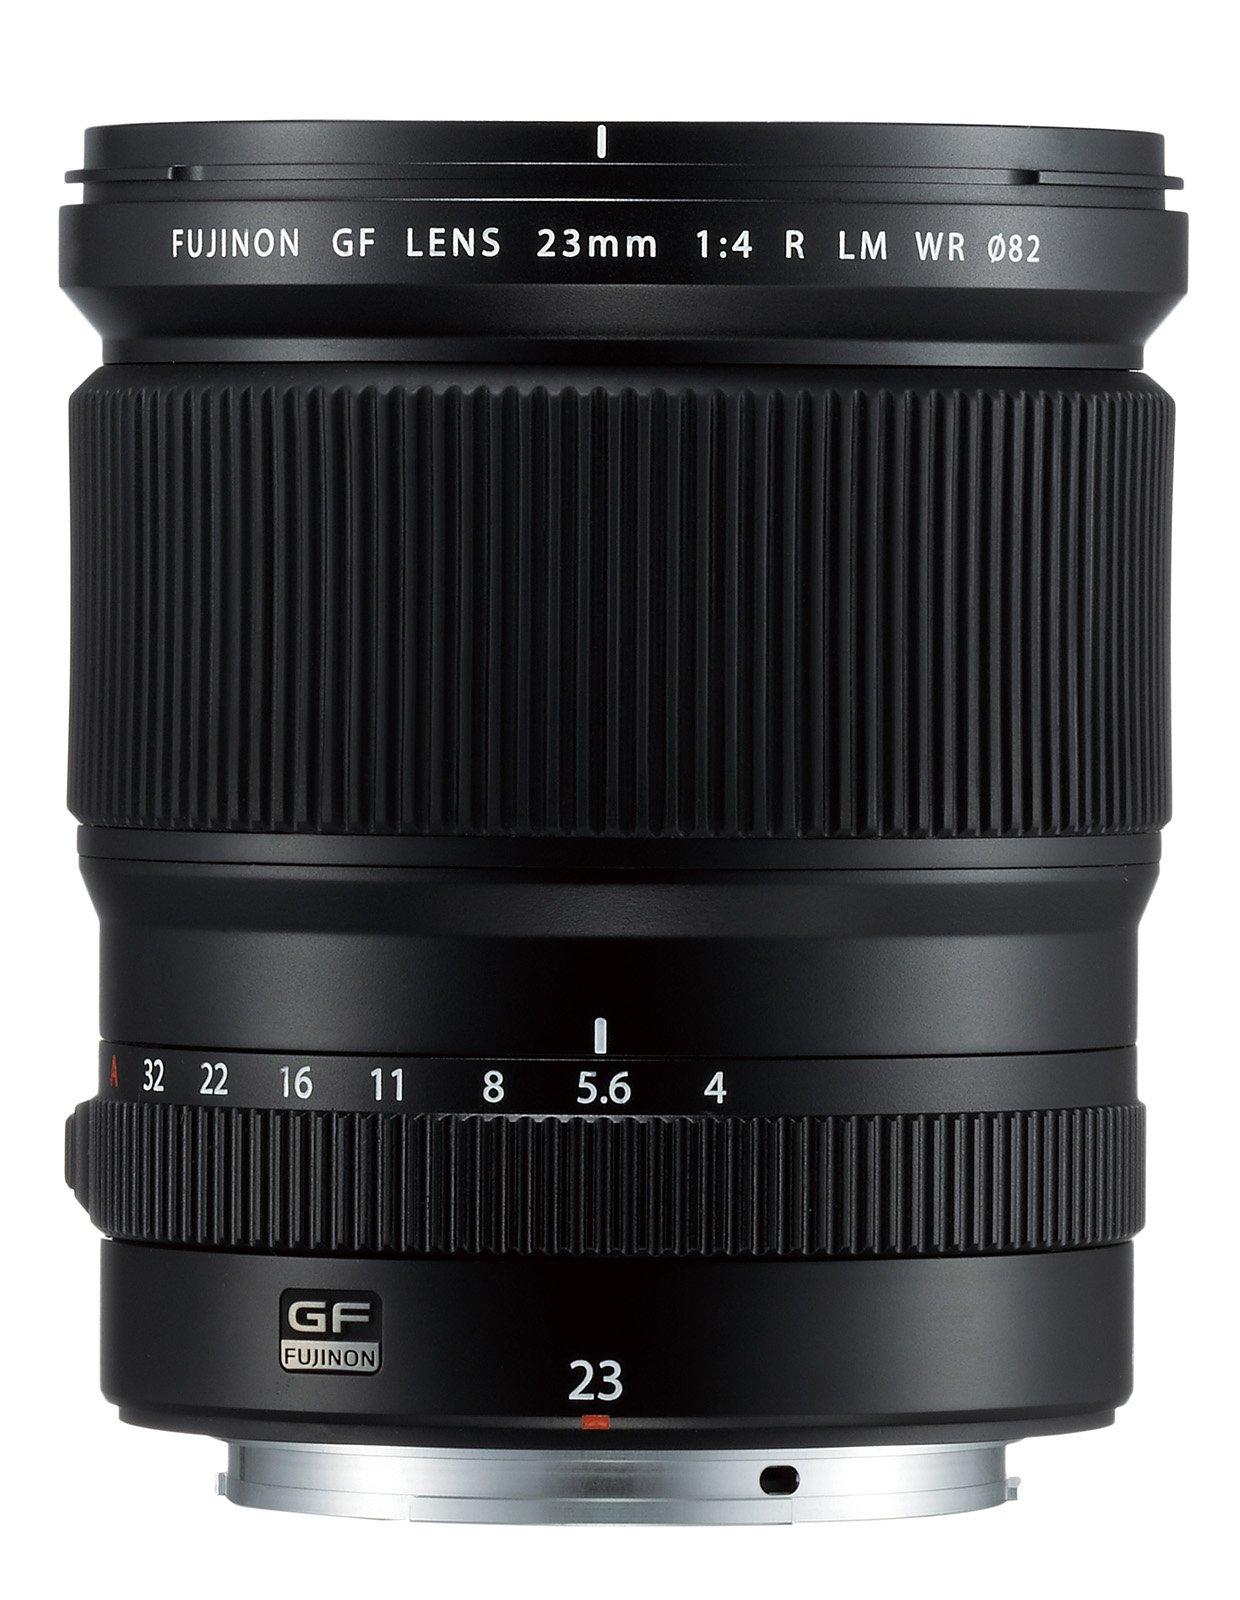 Fuji Reveals 2 New Medium Format Lenses and Updated Lens Roadmap